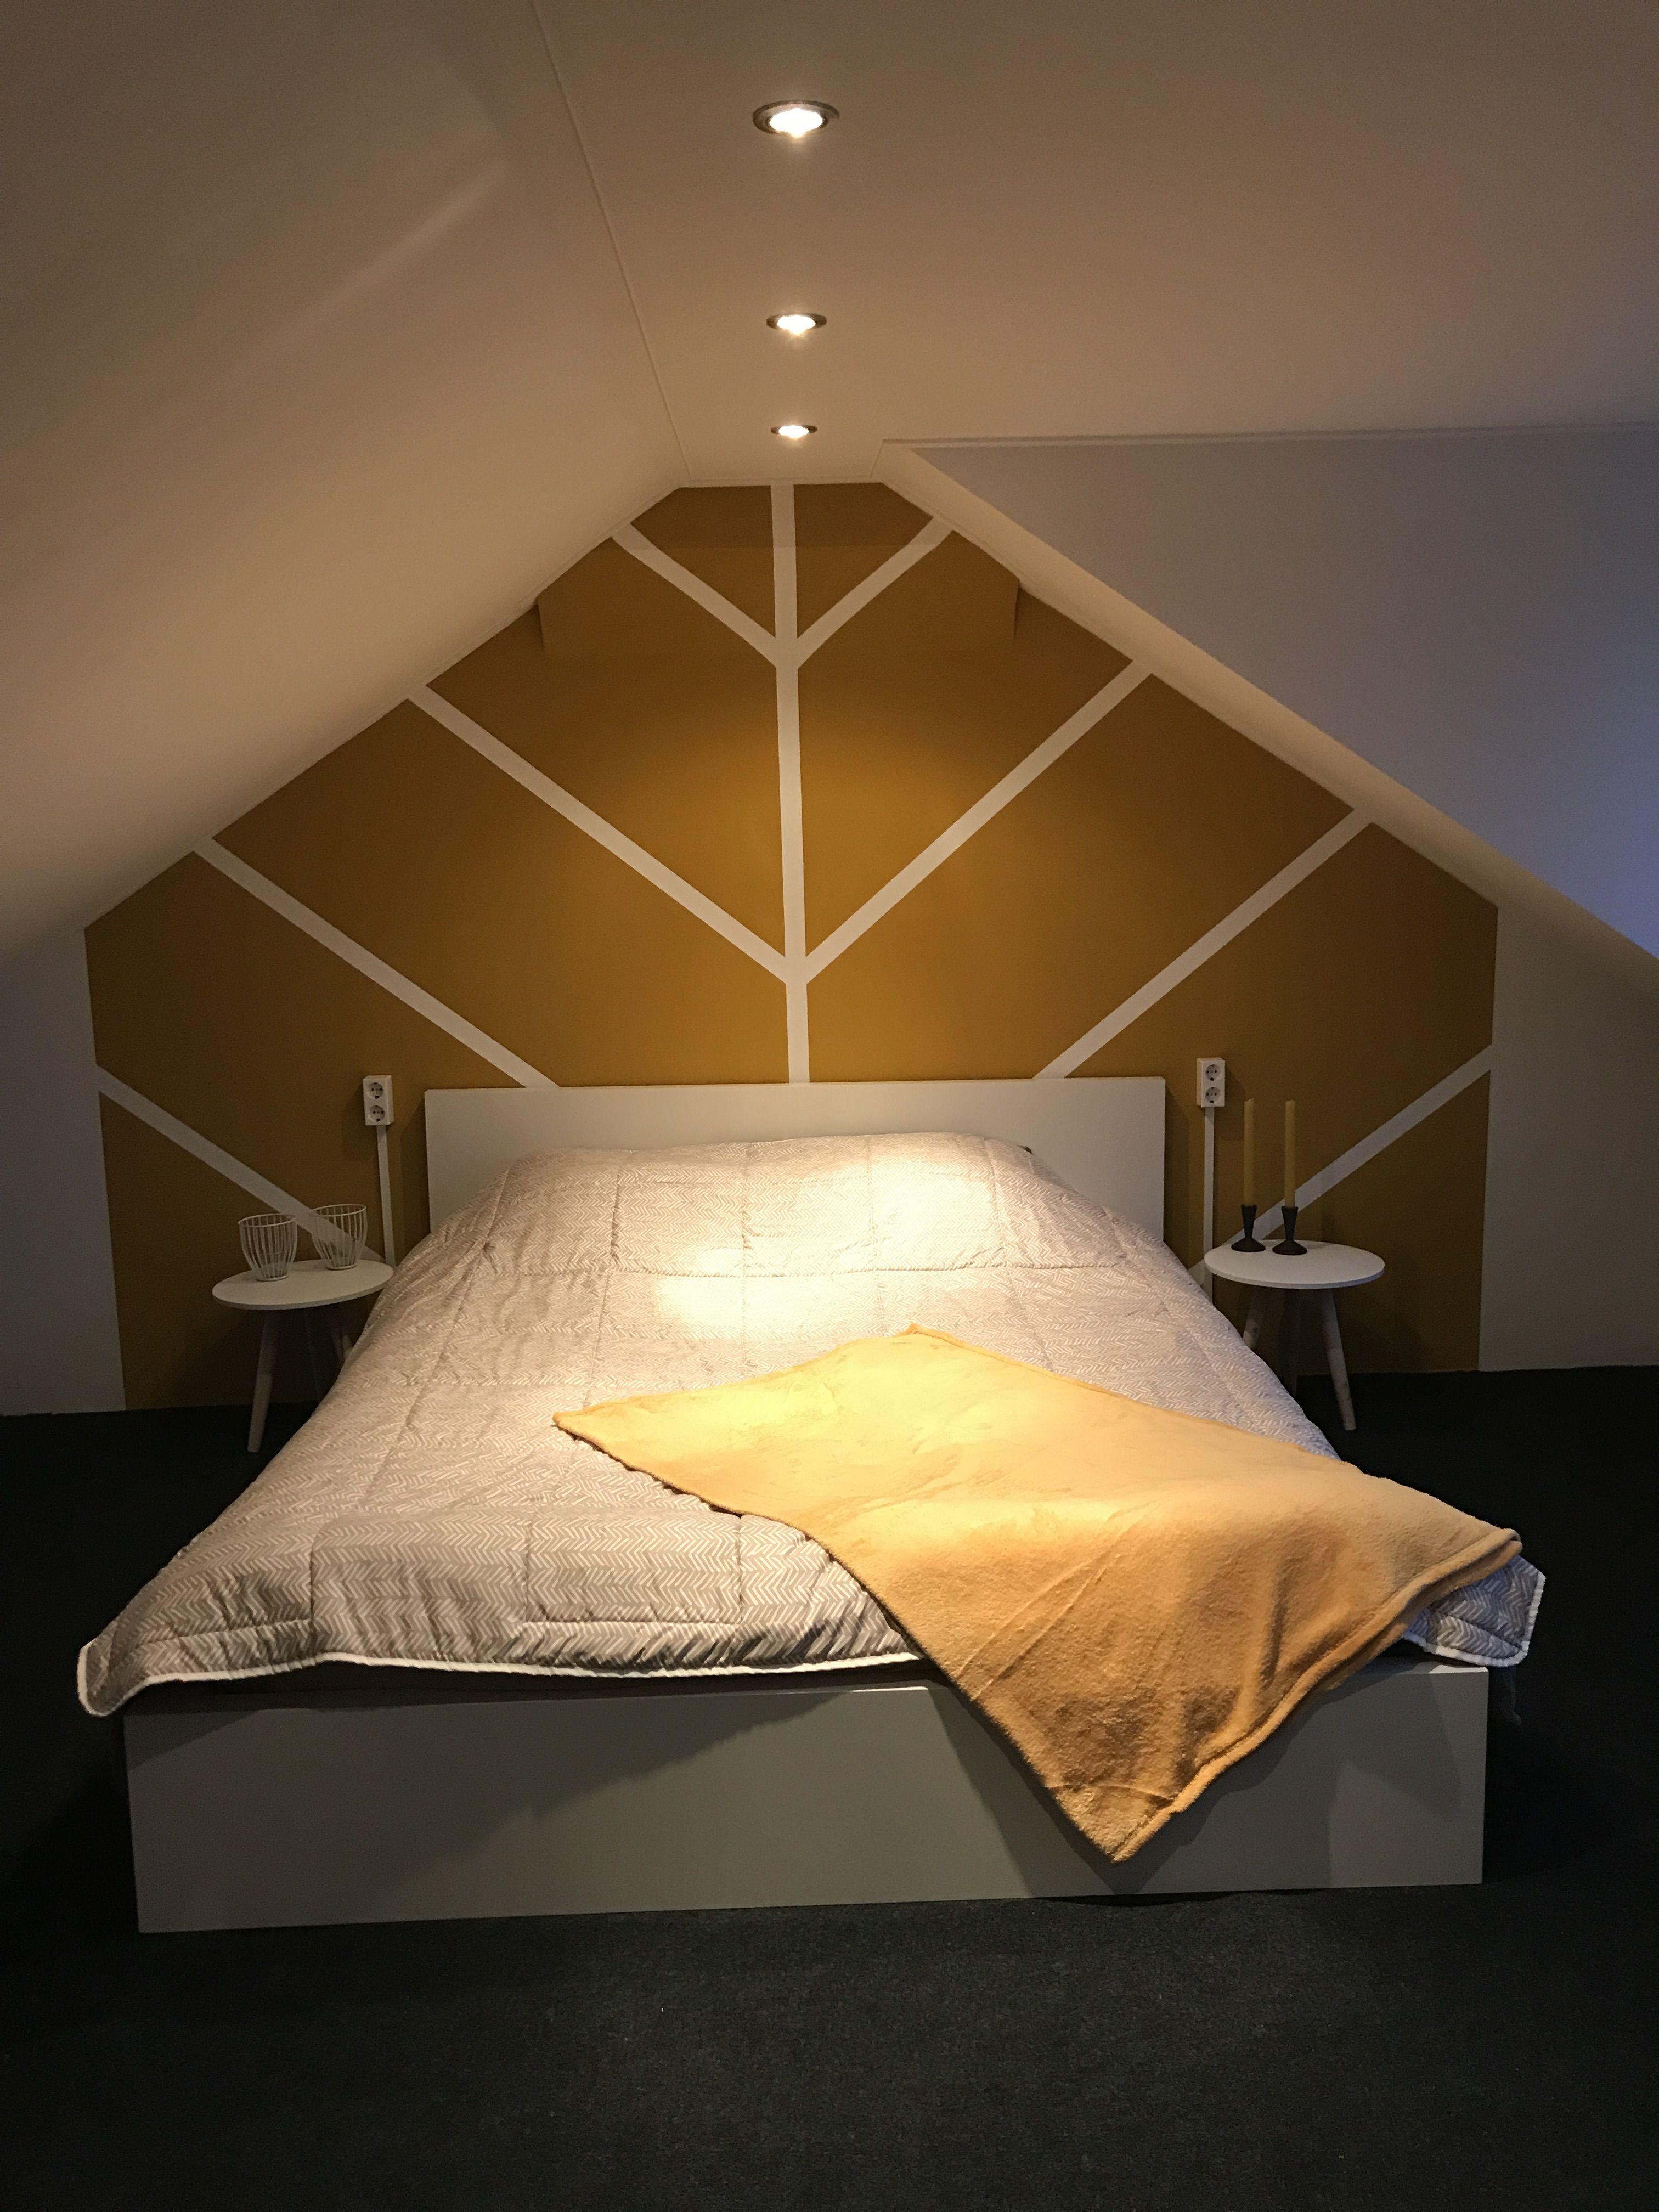 Bedroom ochre wall plaid Slaapkamer okergeel wand plaid ...